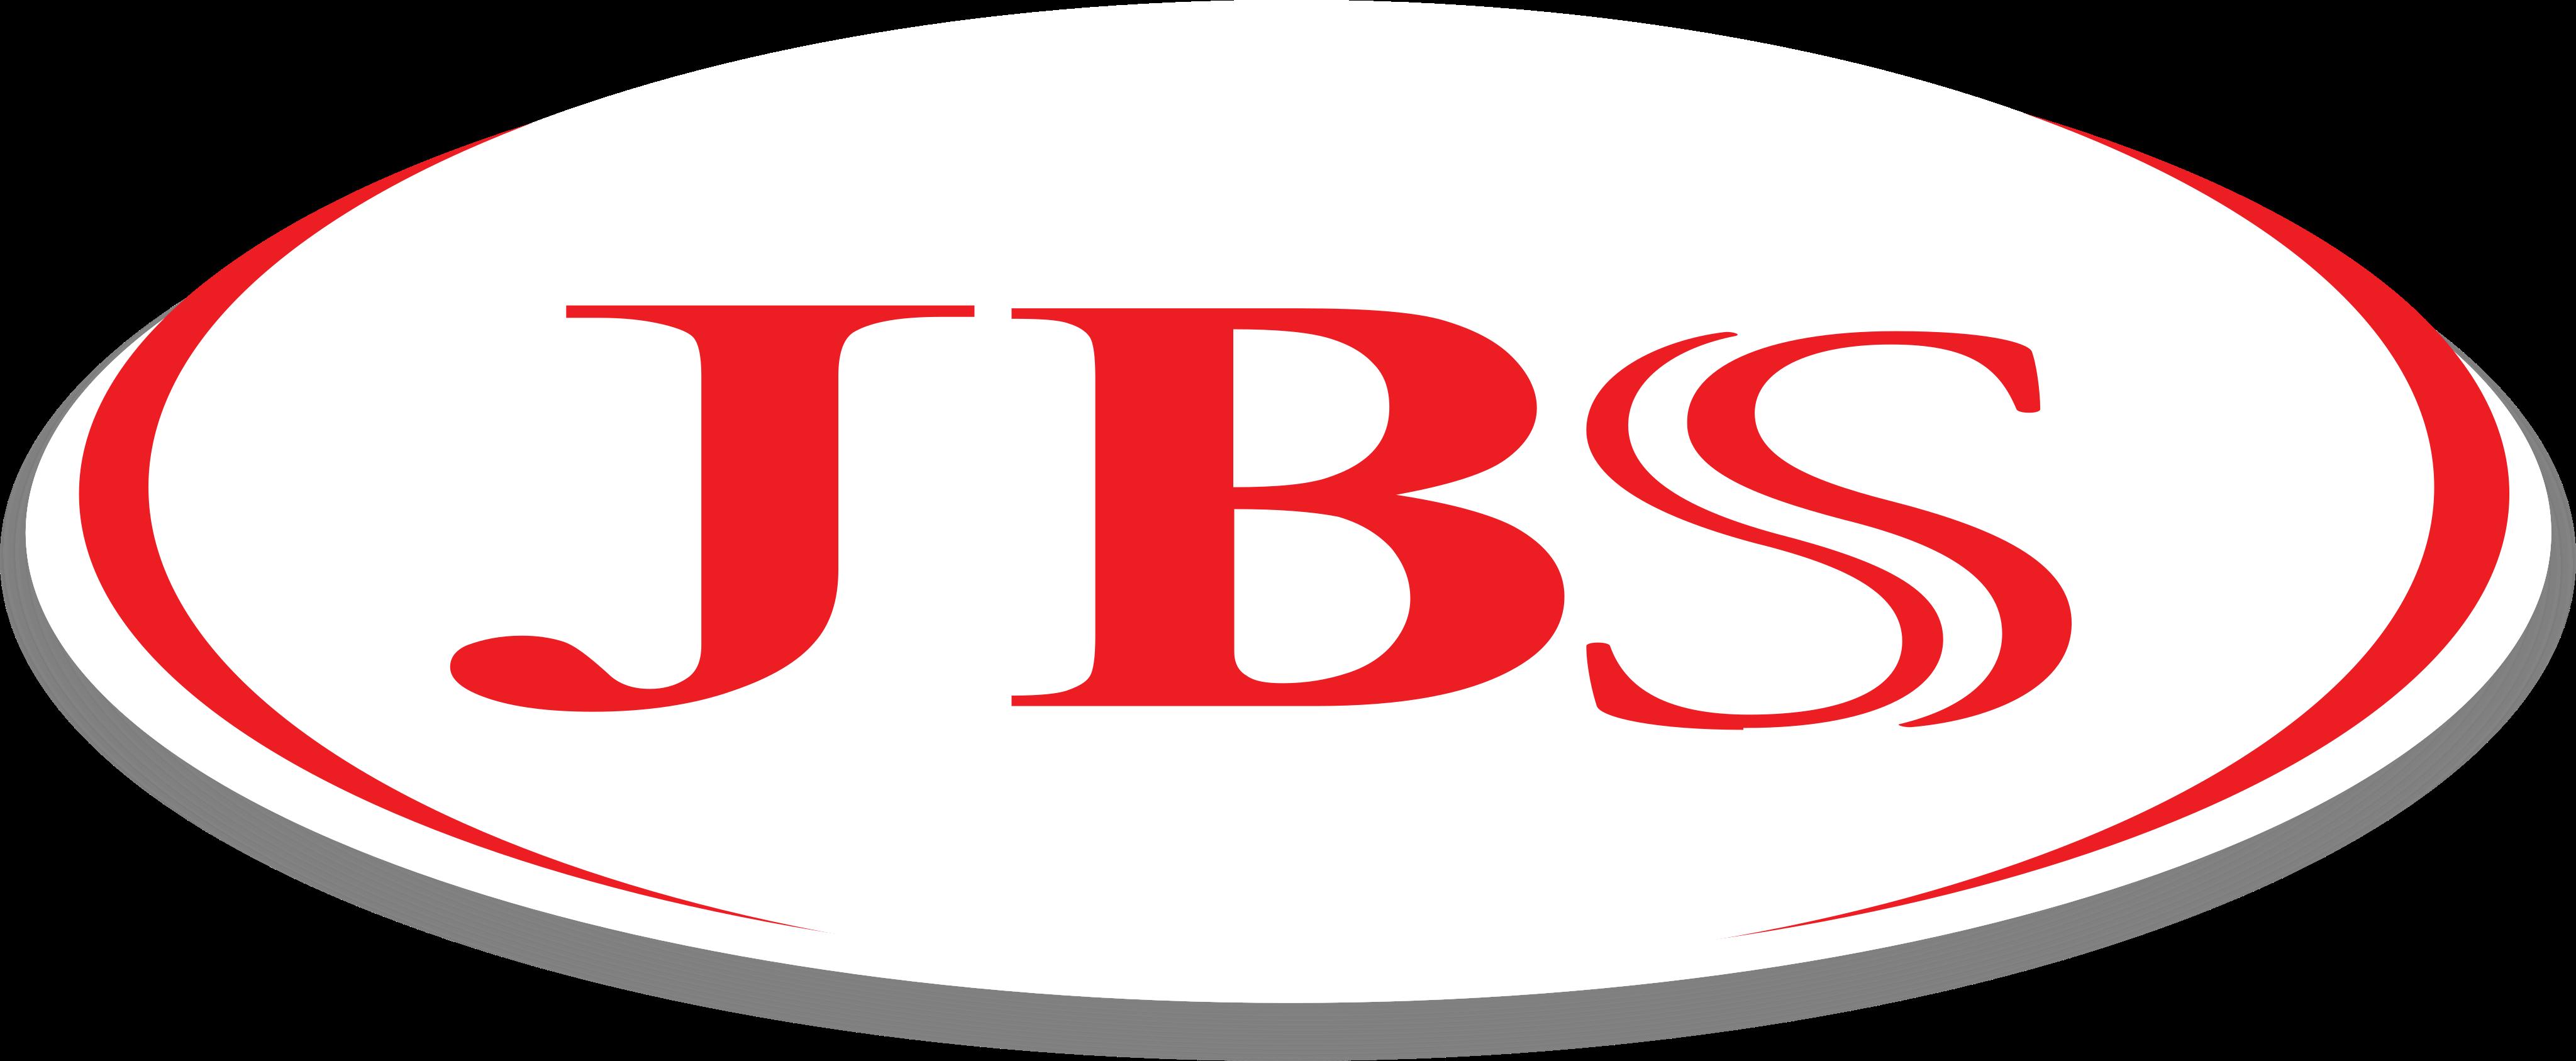 jbs logo - JBS Foods Logo